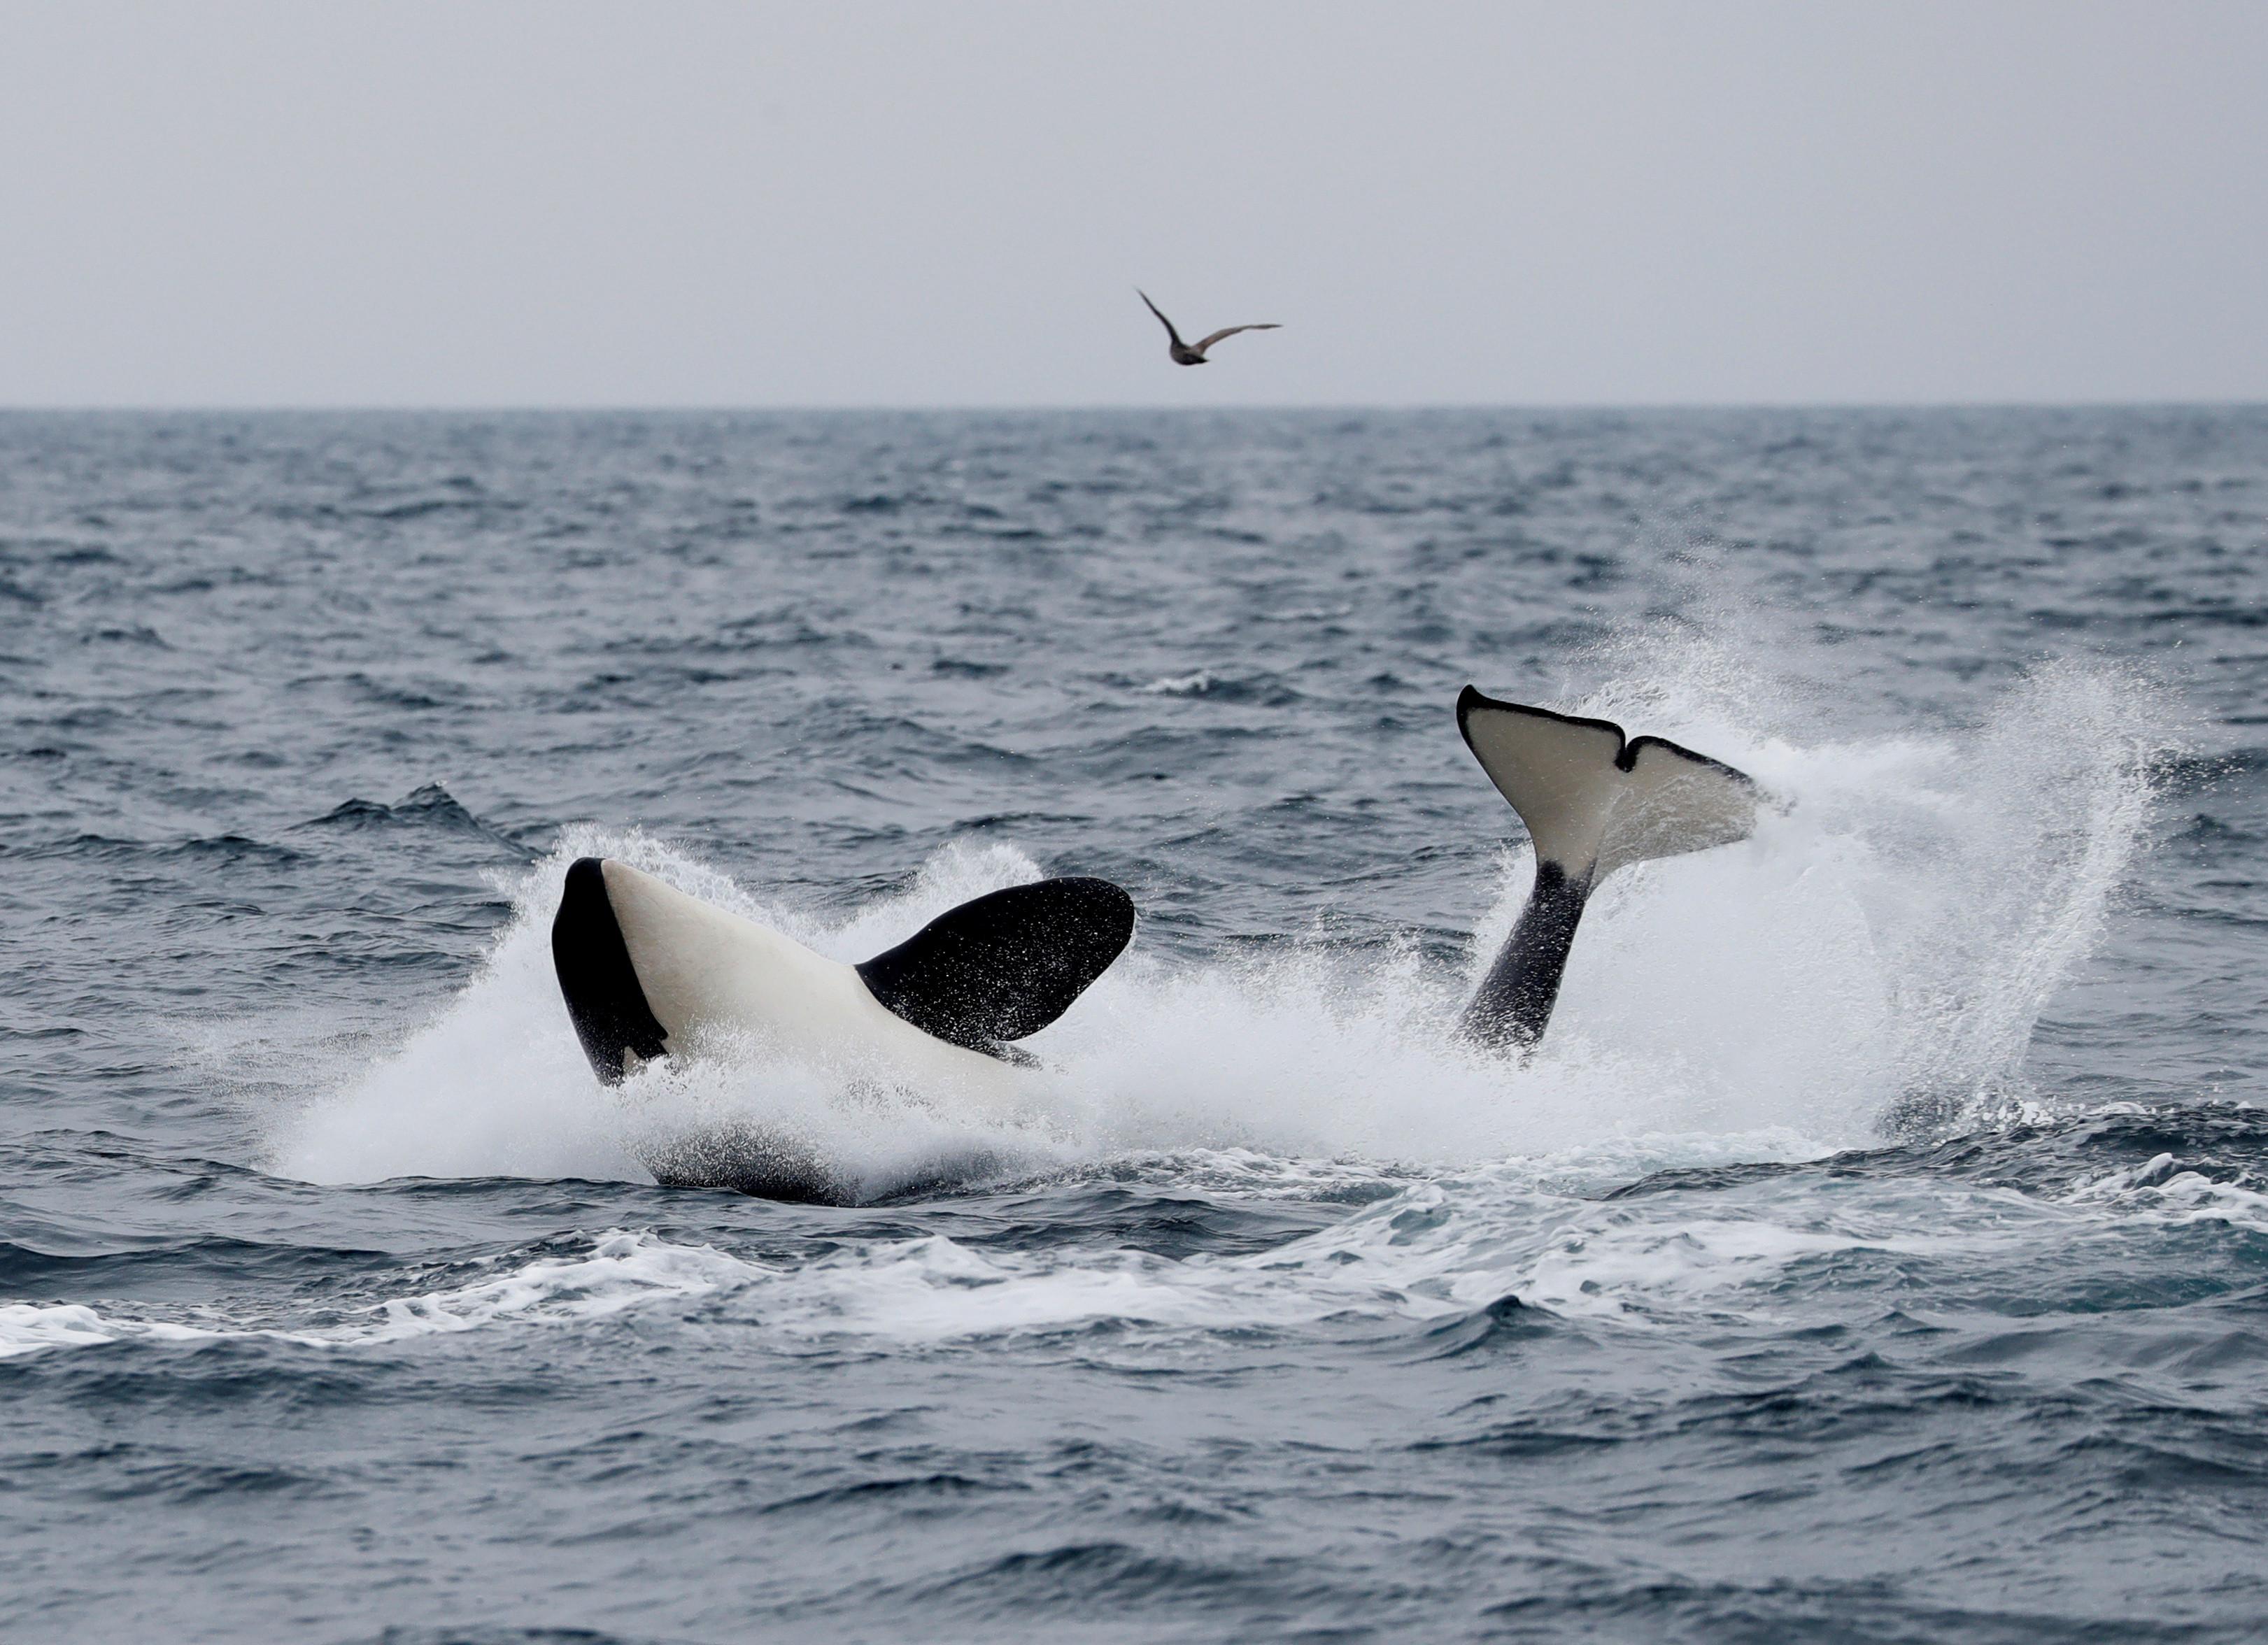 A killer whale swims in the sea near Rausu, Hokkaido, Japan, July 1, 2019.Picture taken July 1, 2019.    REUTERS/Kim Kyung-Hoon - RC1A2E1629D0